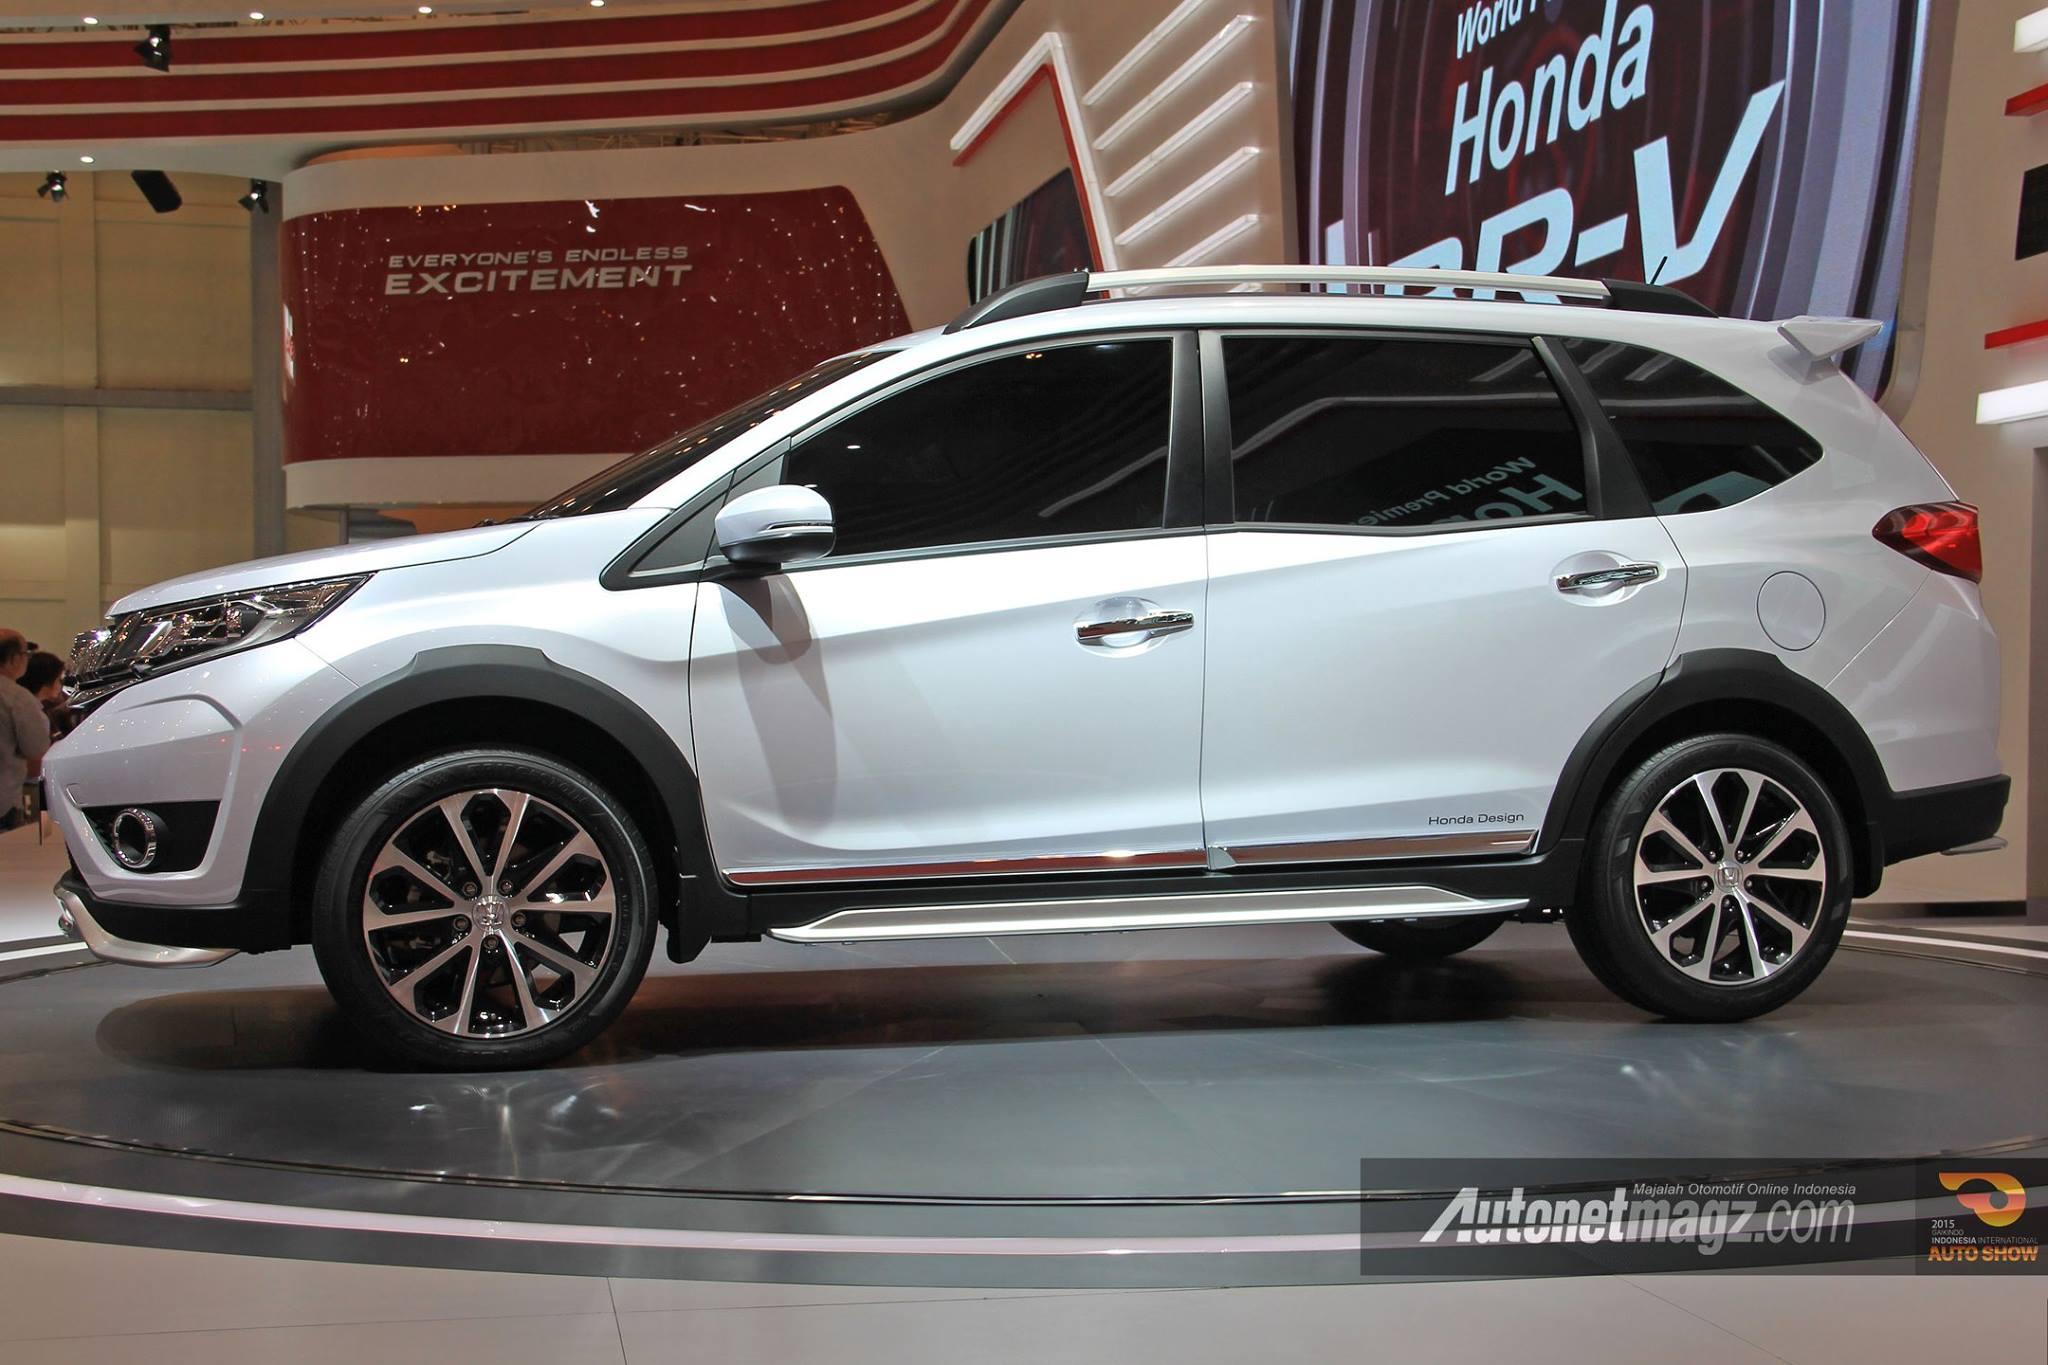 Foto Honda BRV AutonetMagz Review Mobil Dan Motor